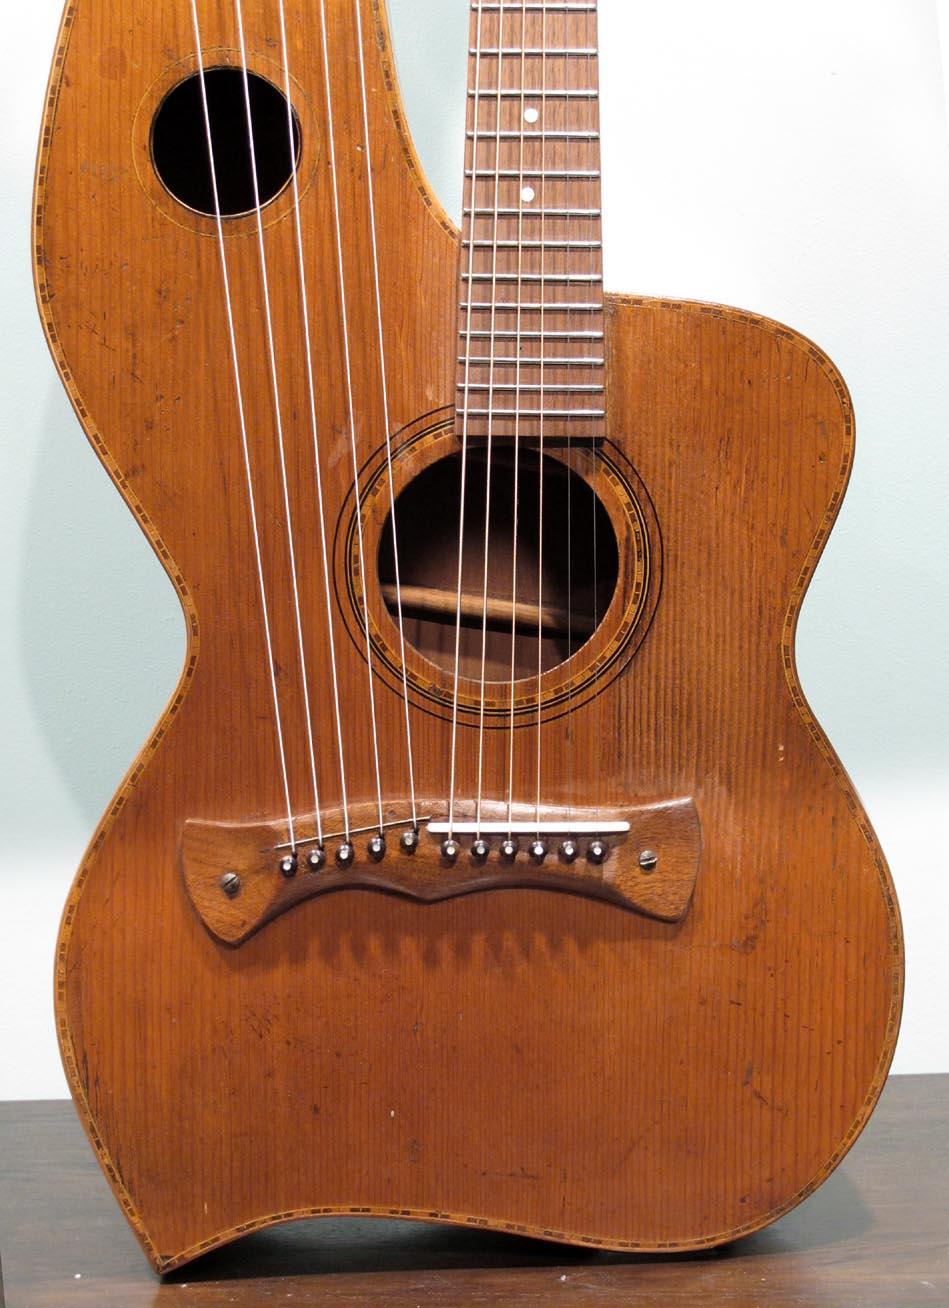 knutsen 3  4 scale harp guitar at harp guitar music